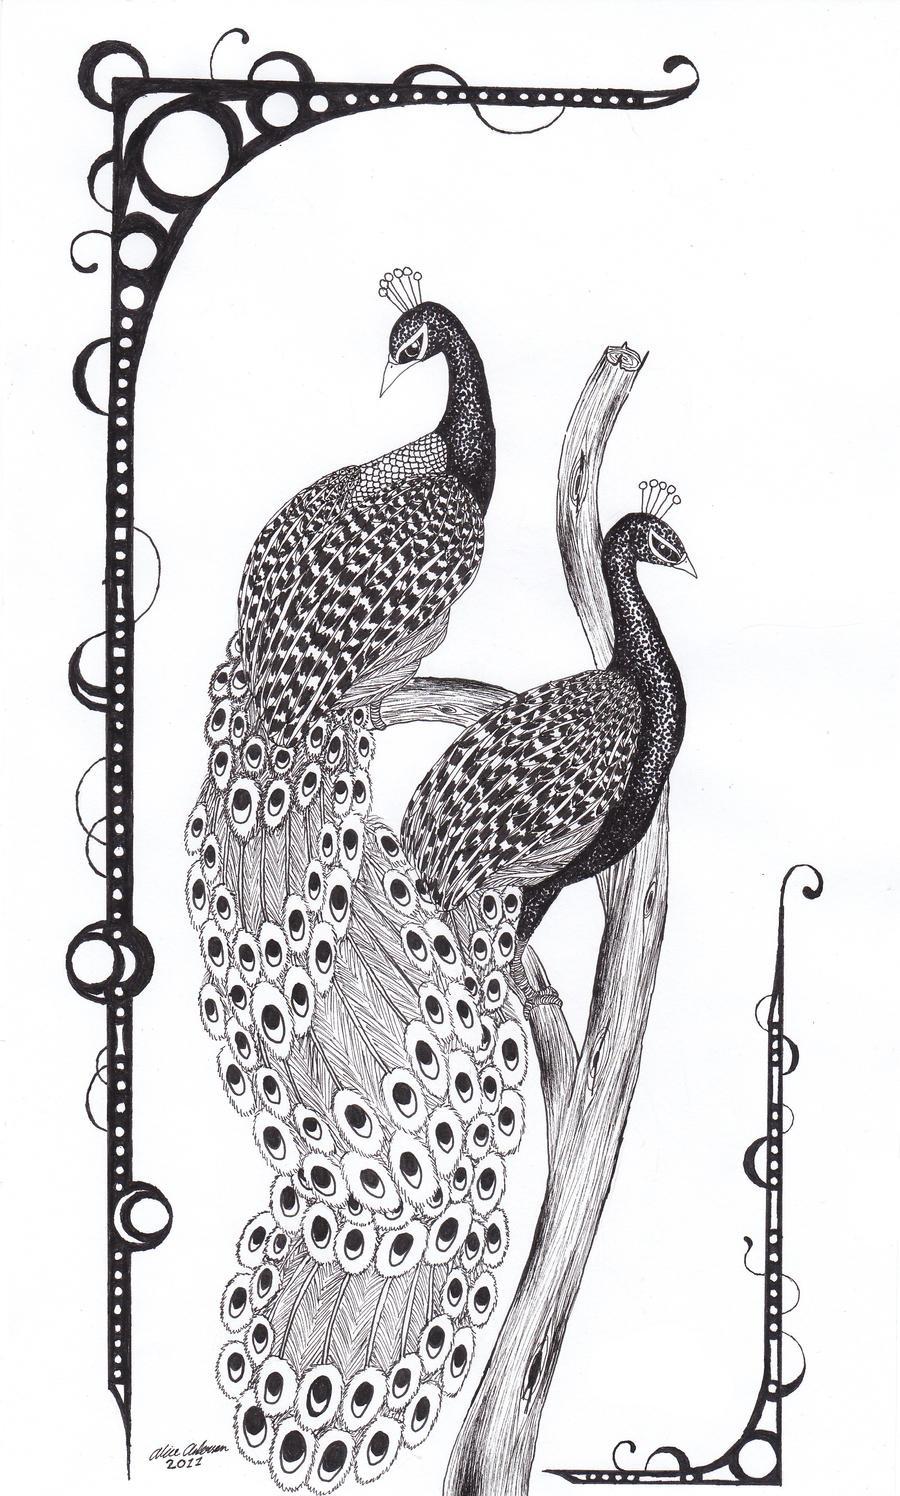 Peacock tree by Uskall